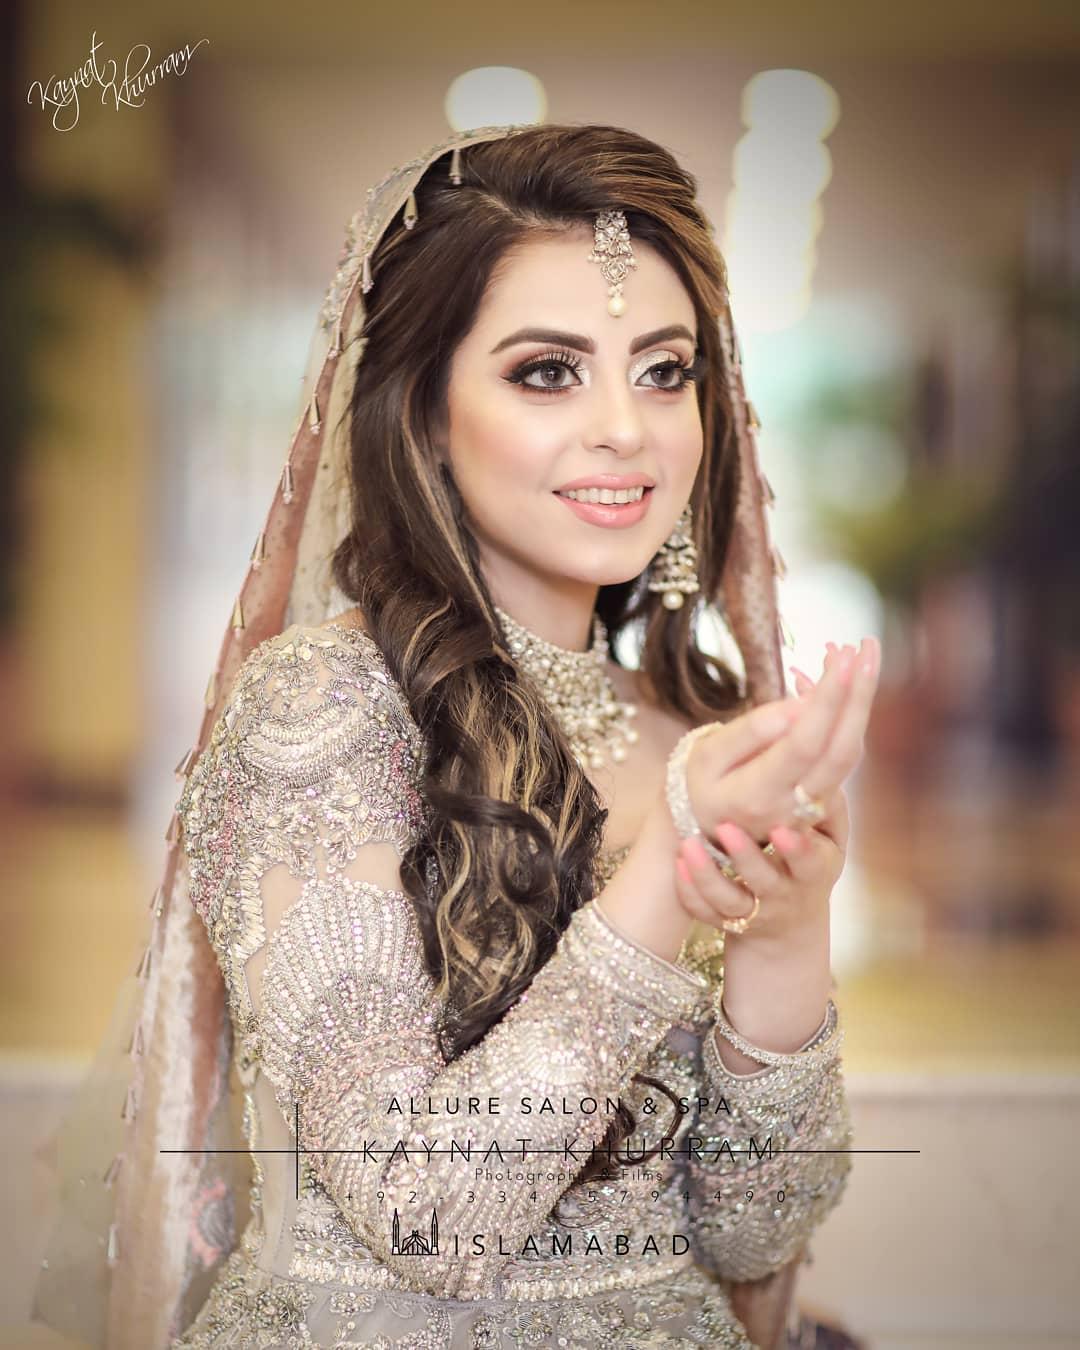 New Awesome Bridal Photoshoot of Actress Yashma Gill